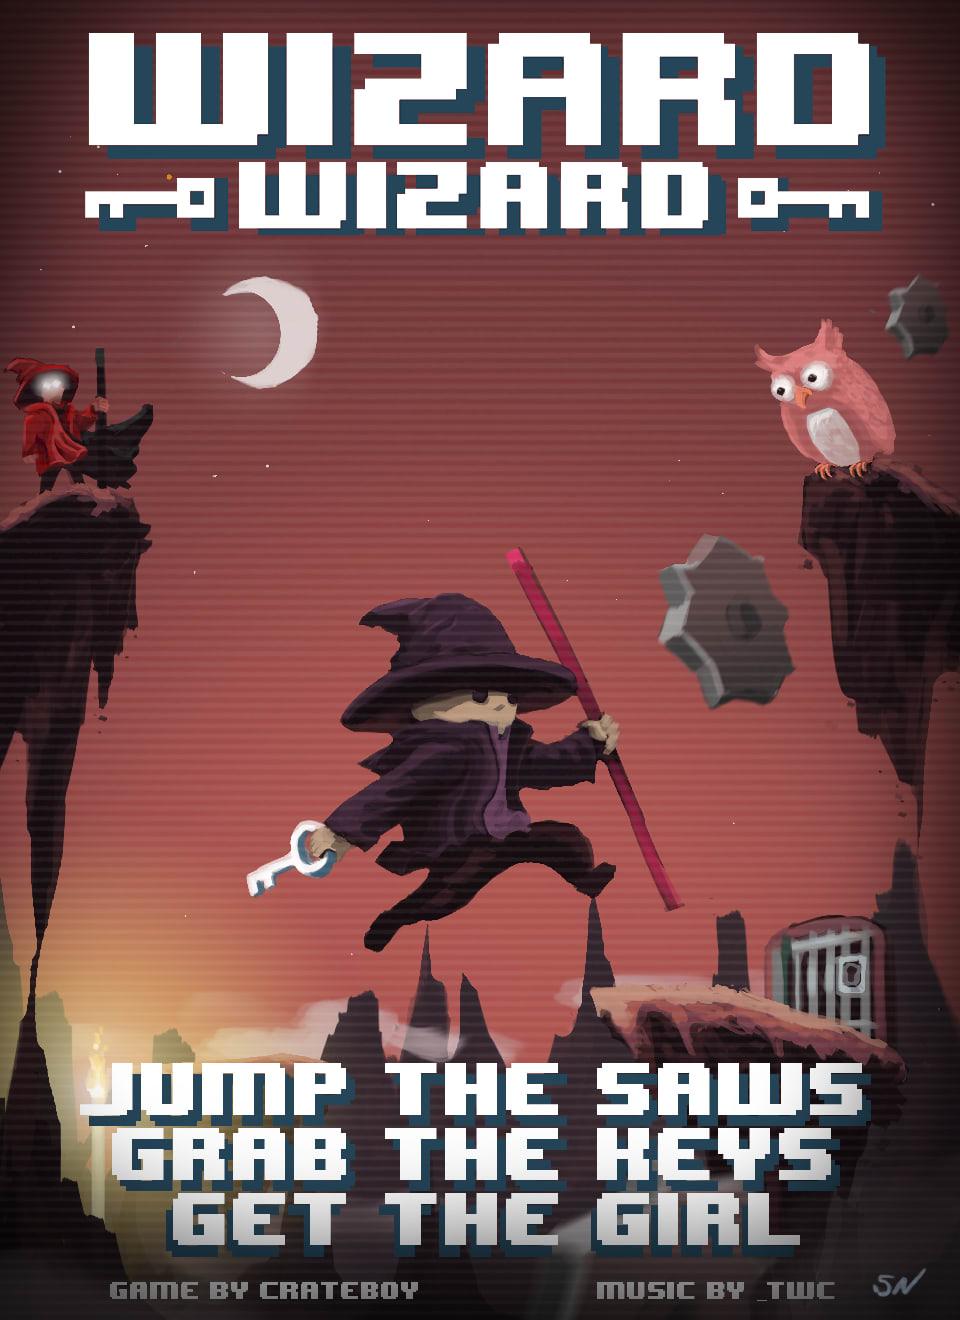 WizardWizard